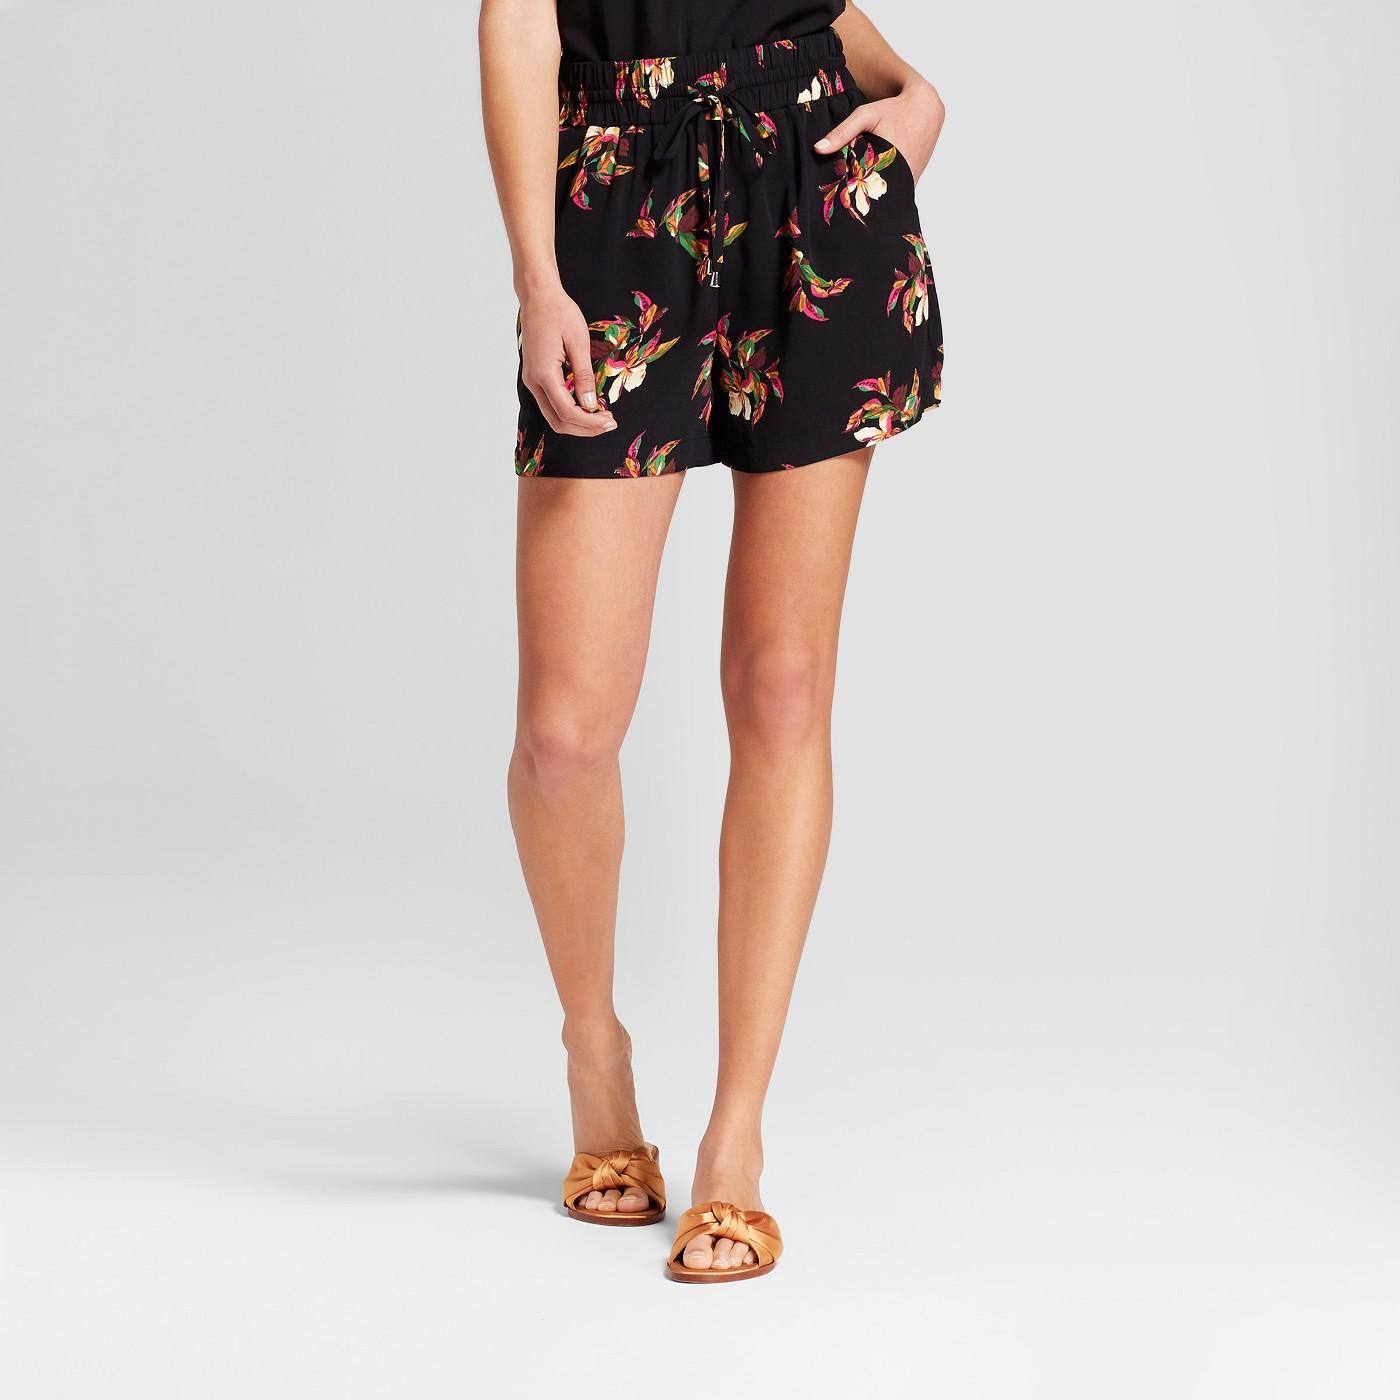 Floral Print Shorts - $13.98